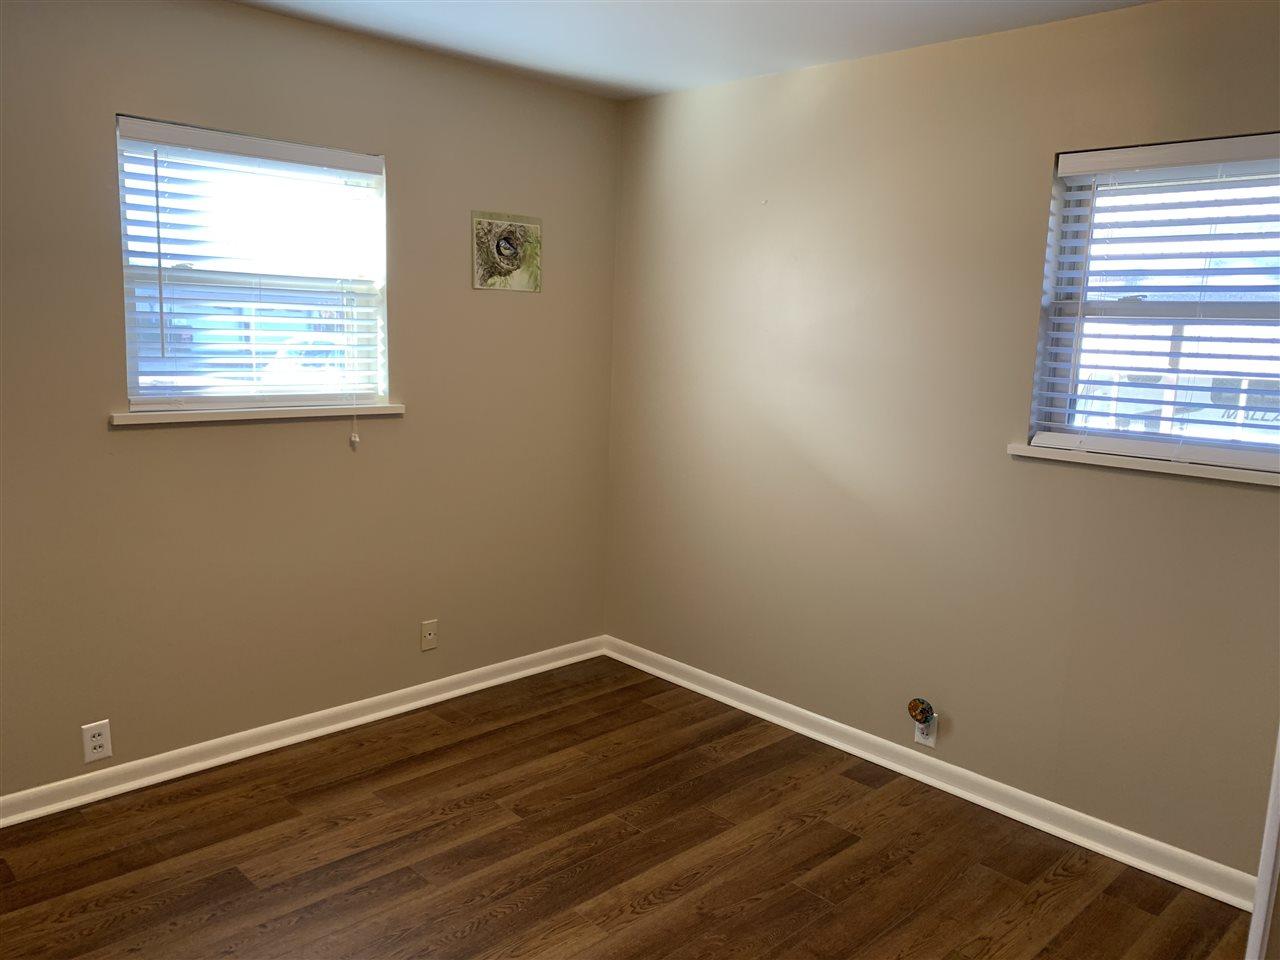 Sold Intraoffice W/MLS | 114 S Peach Newkirk, OK 74647 20